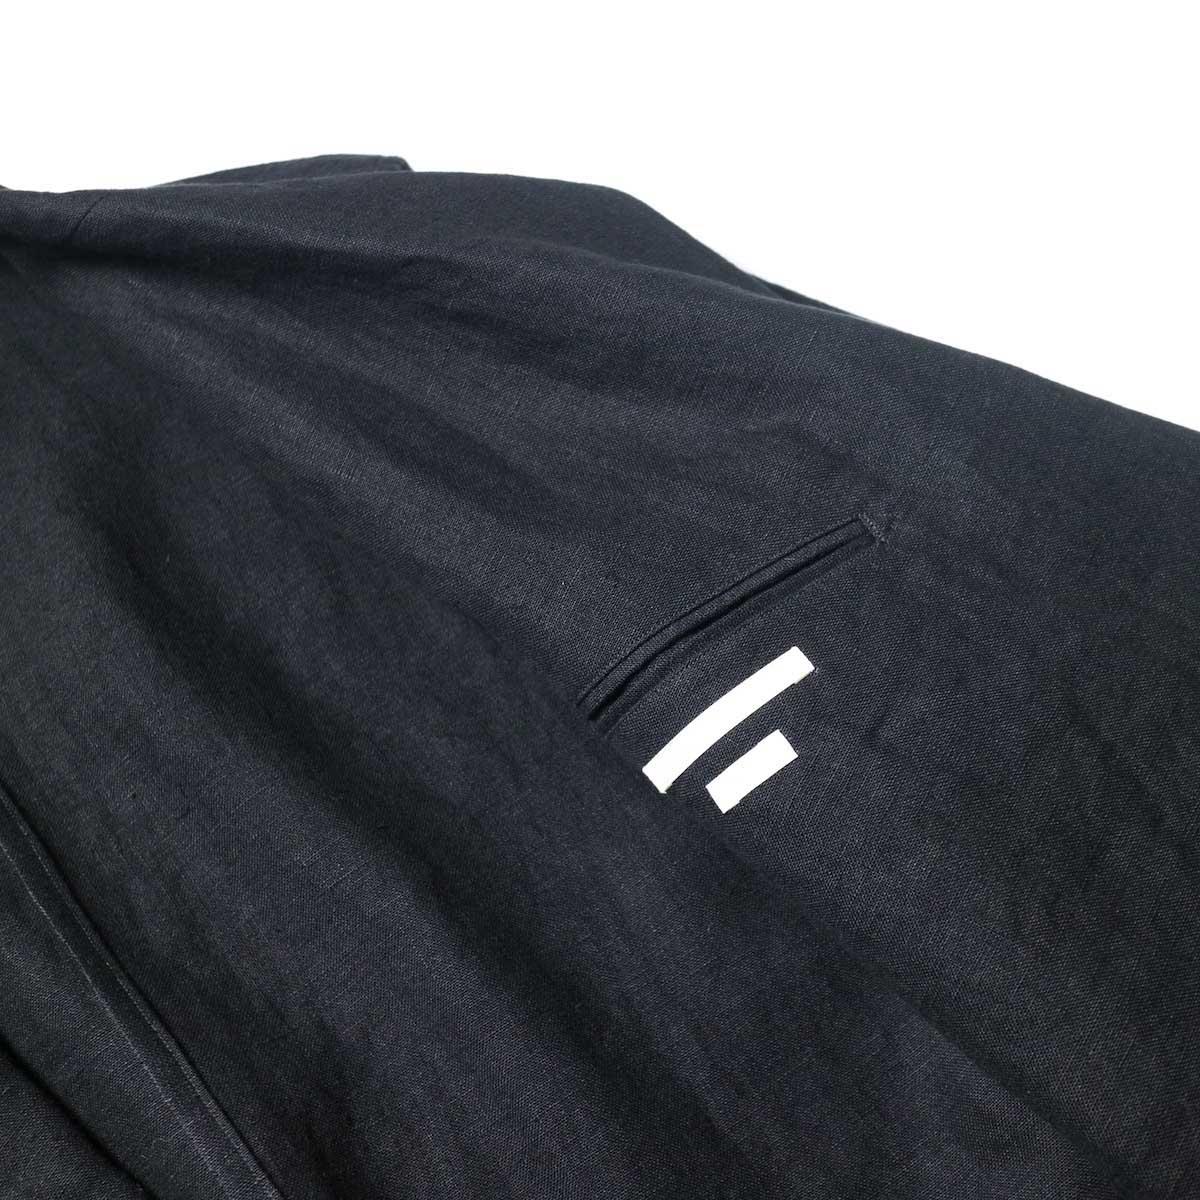 blurhms / Wash Linen Cardigan Jacket (Black)内ポケット